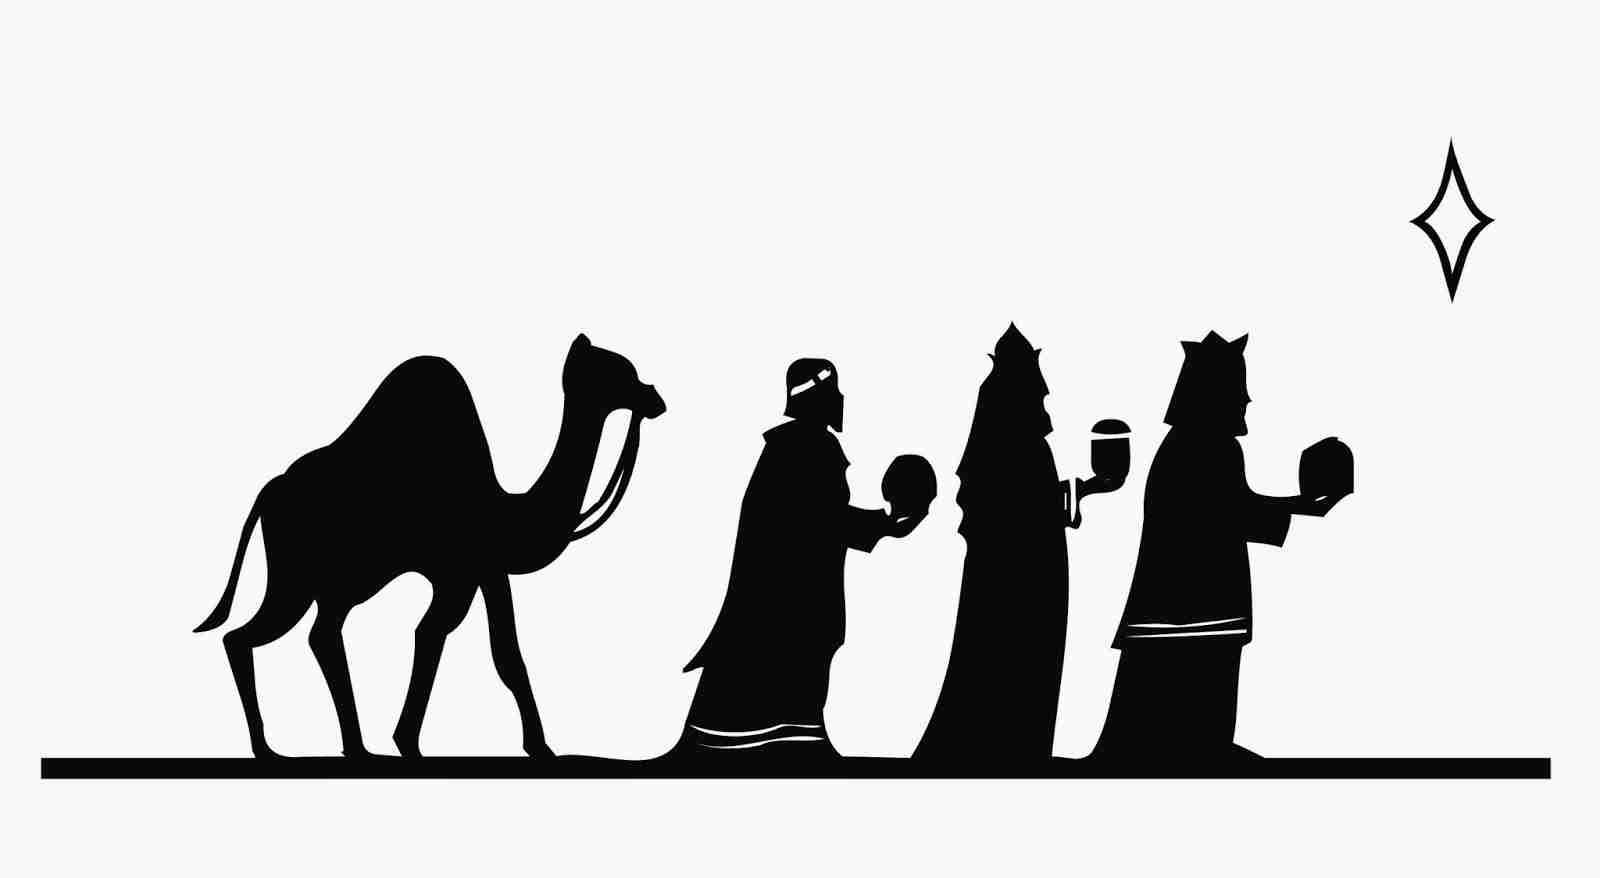 Silhouette Of Wise Men At Getdrawings